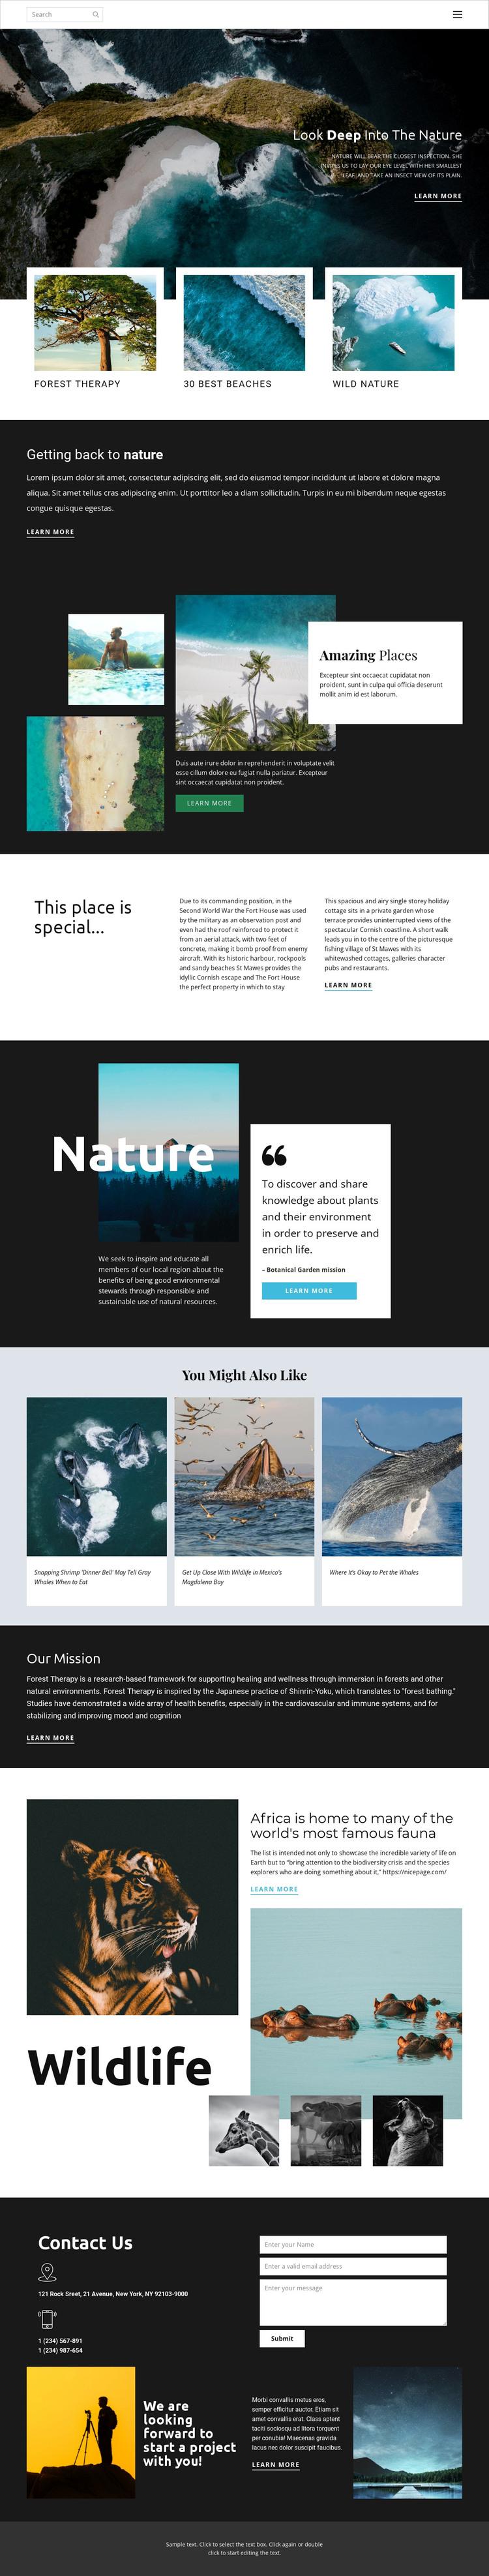 Exploring wildlife and nature Web Design